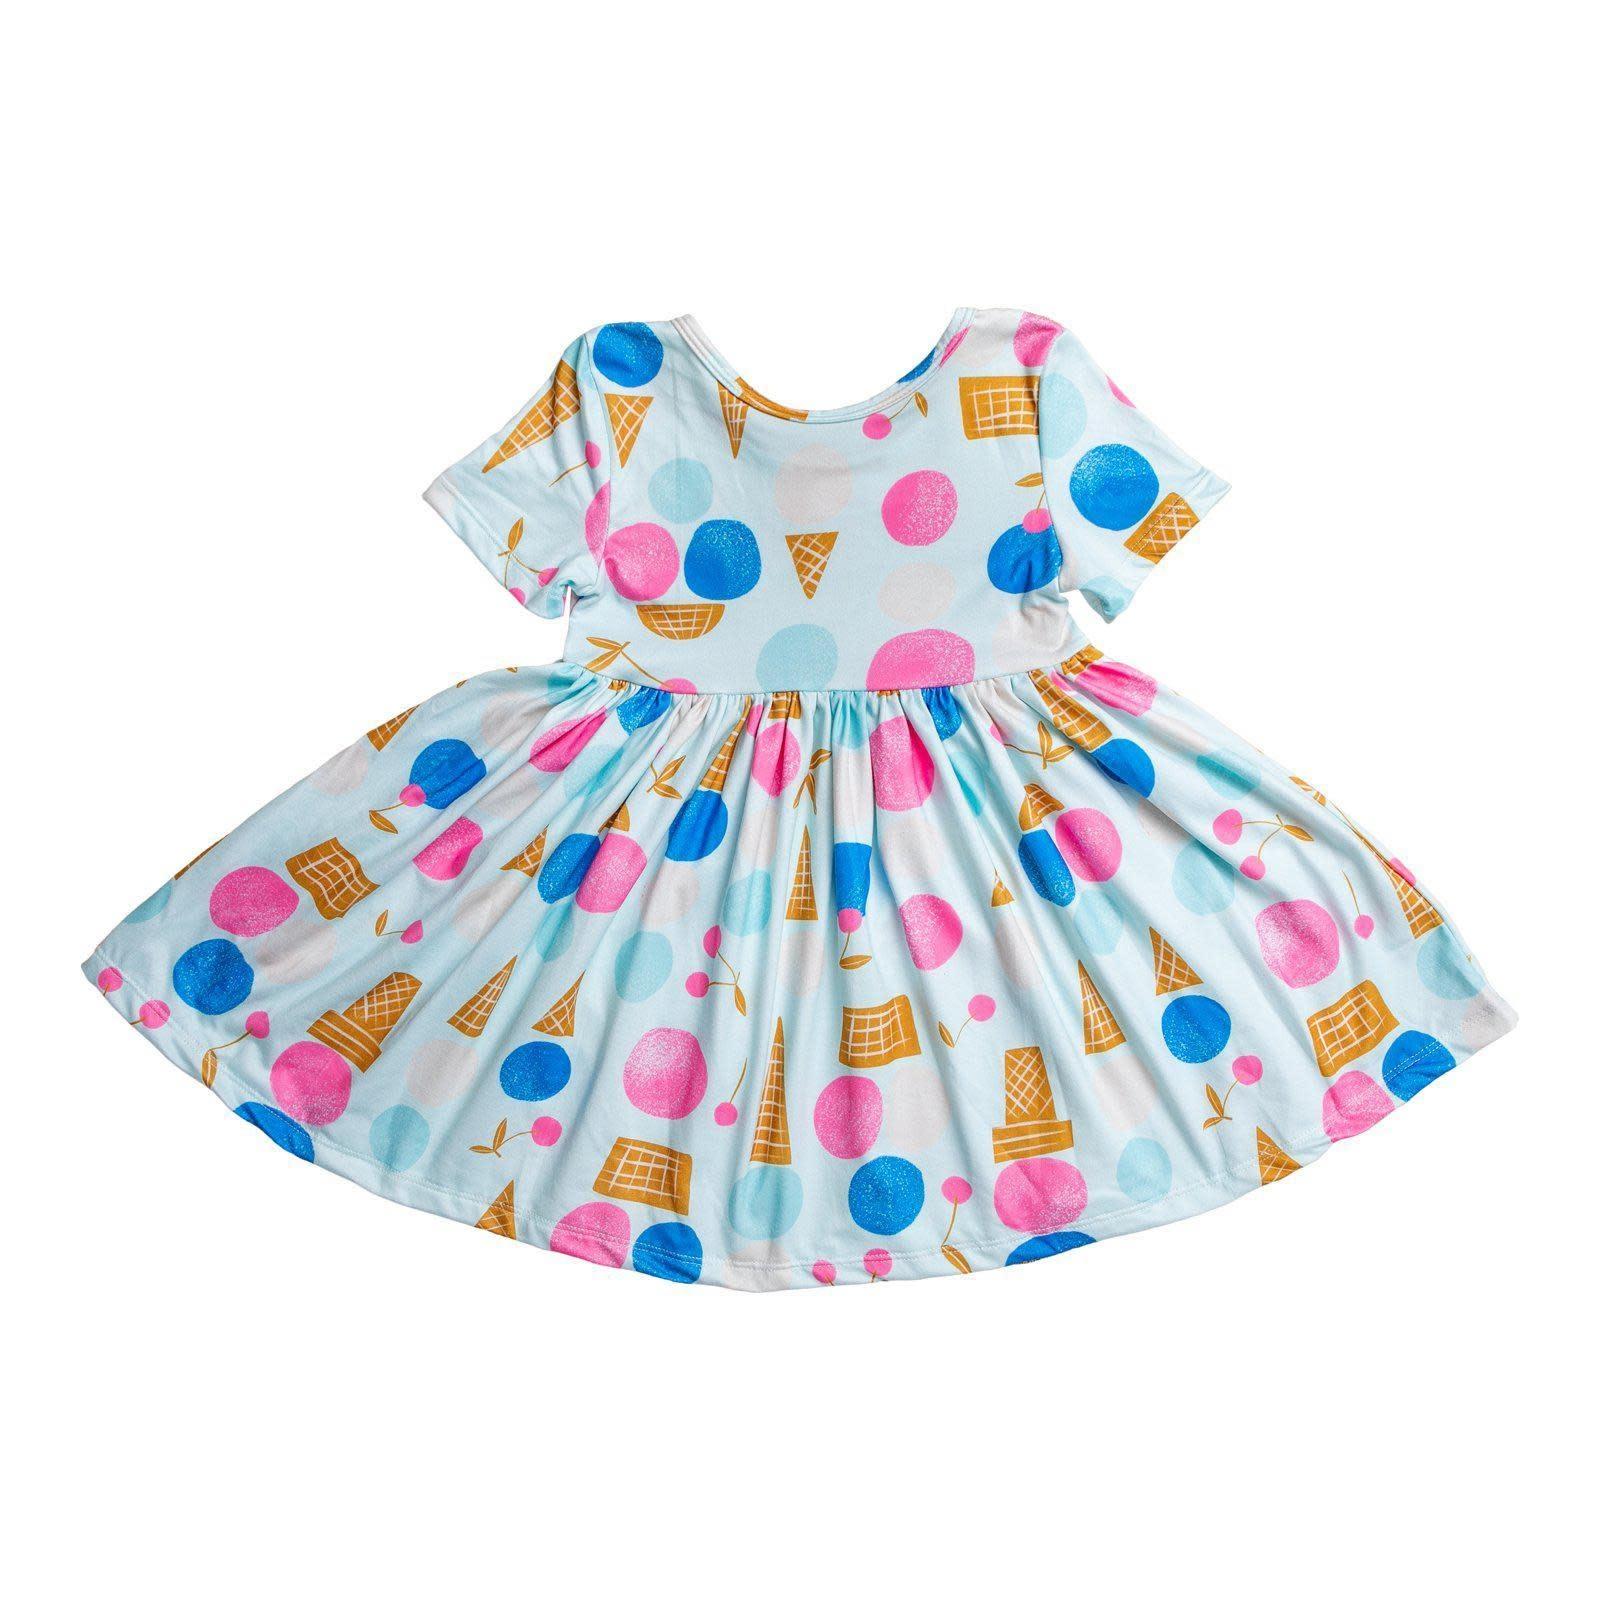 Mila & Rose We all Scream Twirl Dress